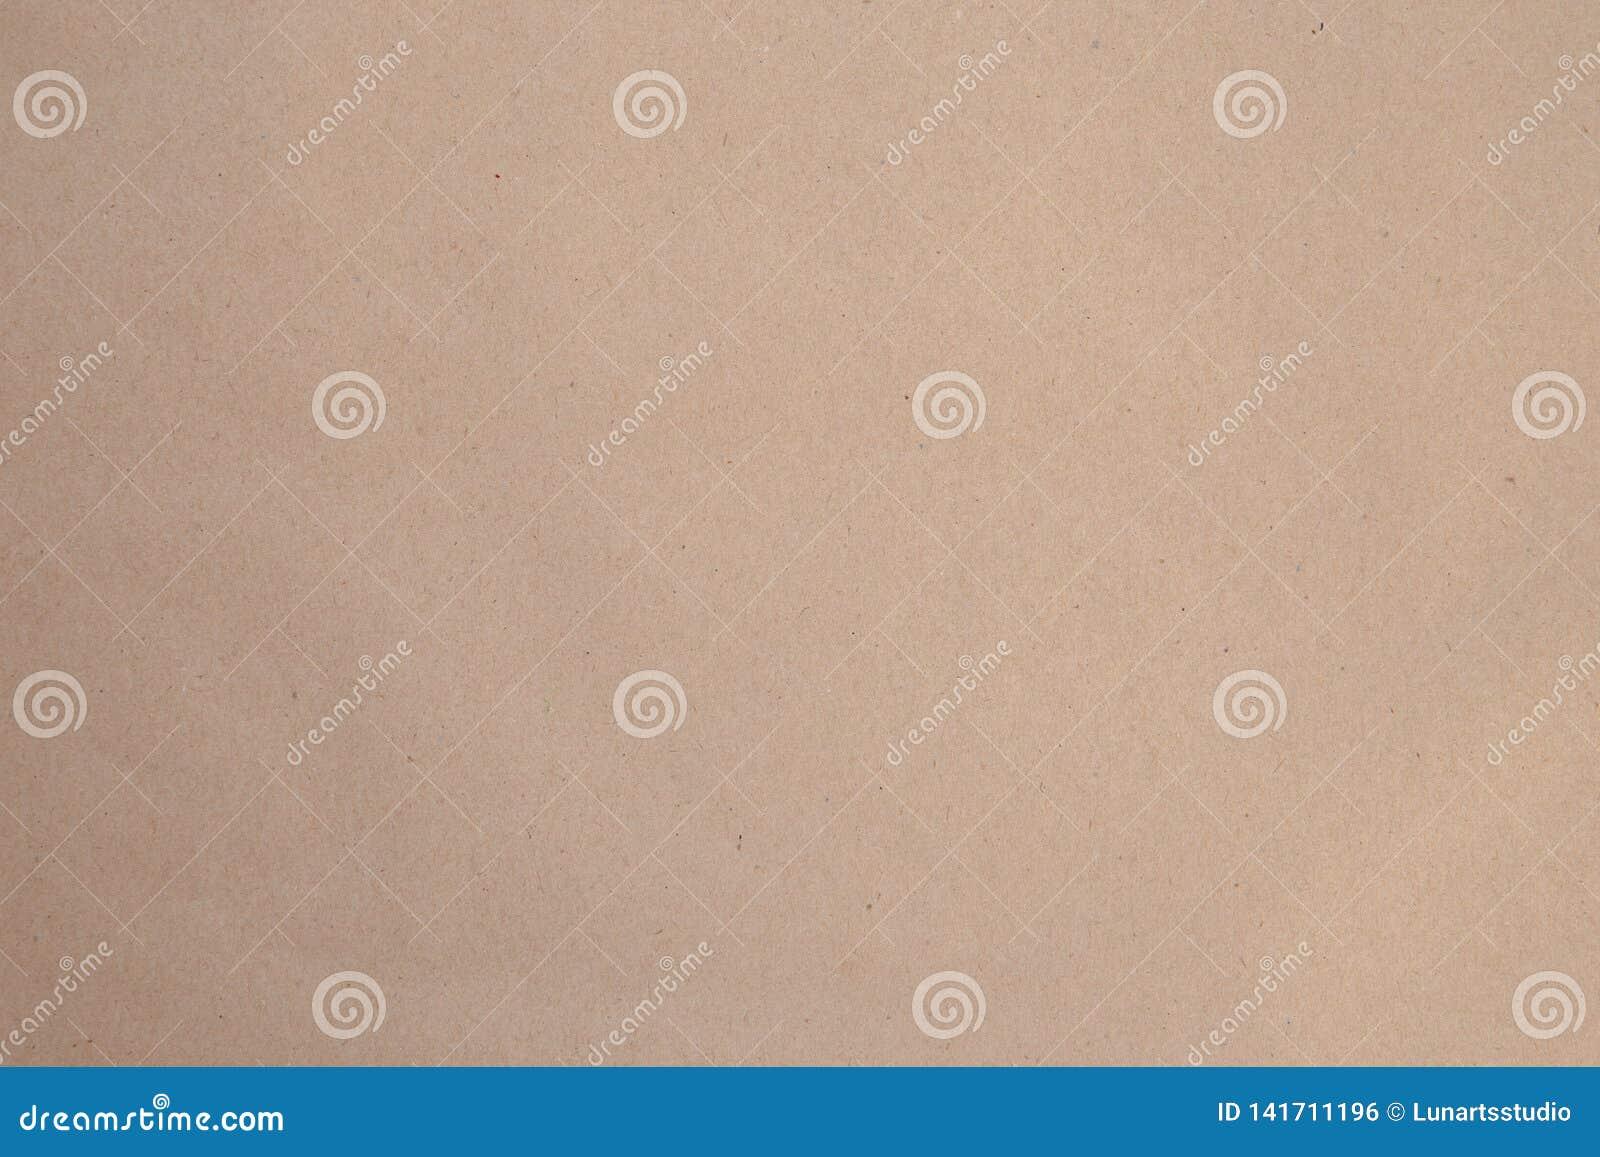 Brown Kraft Paper Textured Background Top View